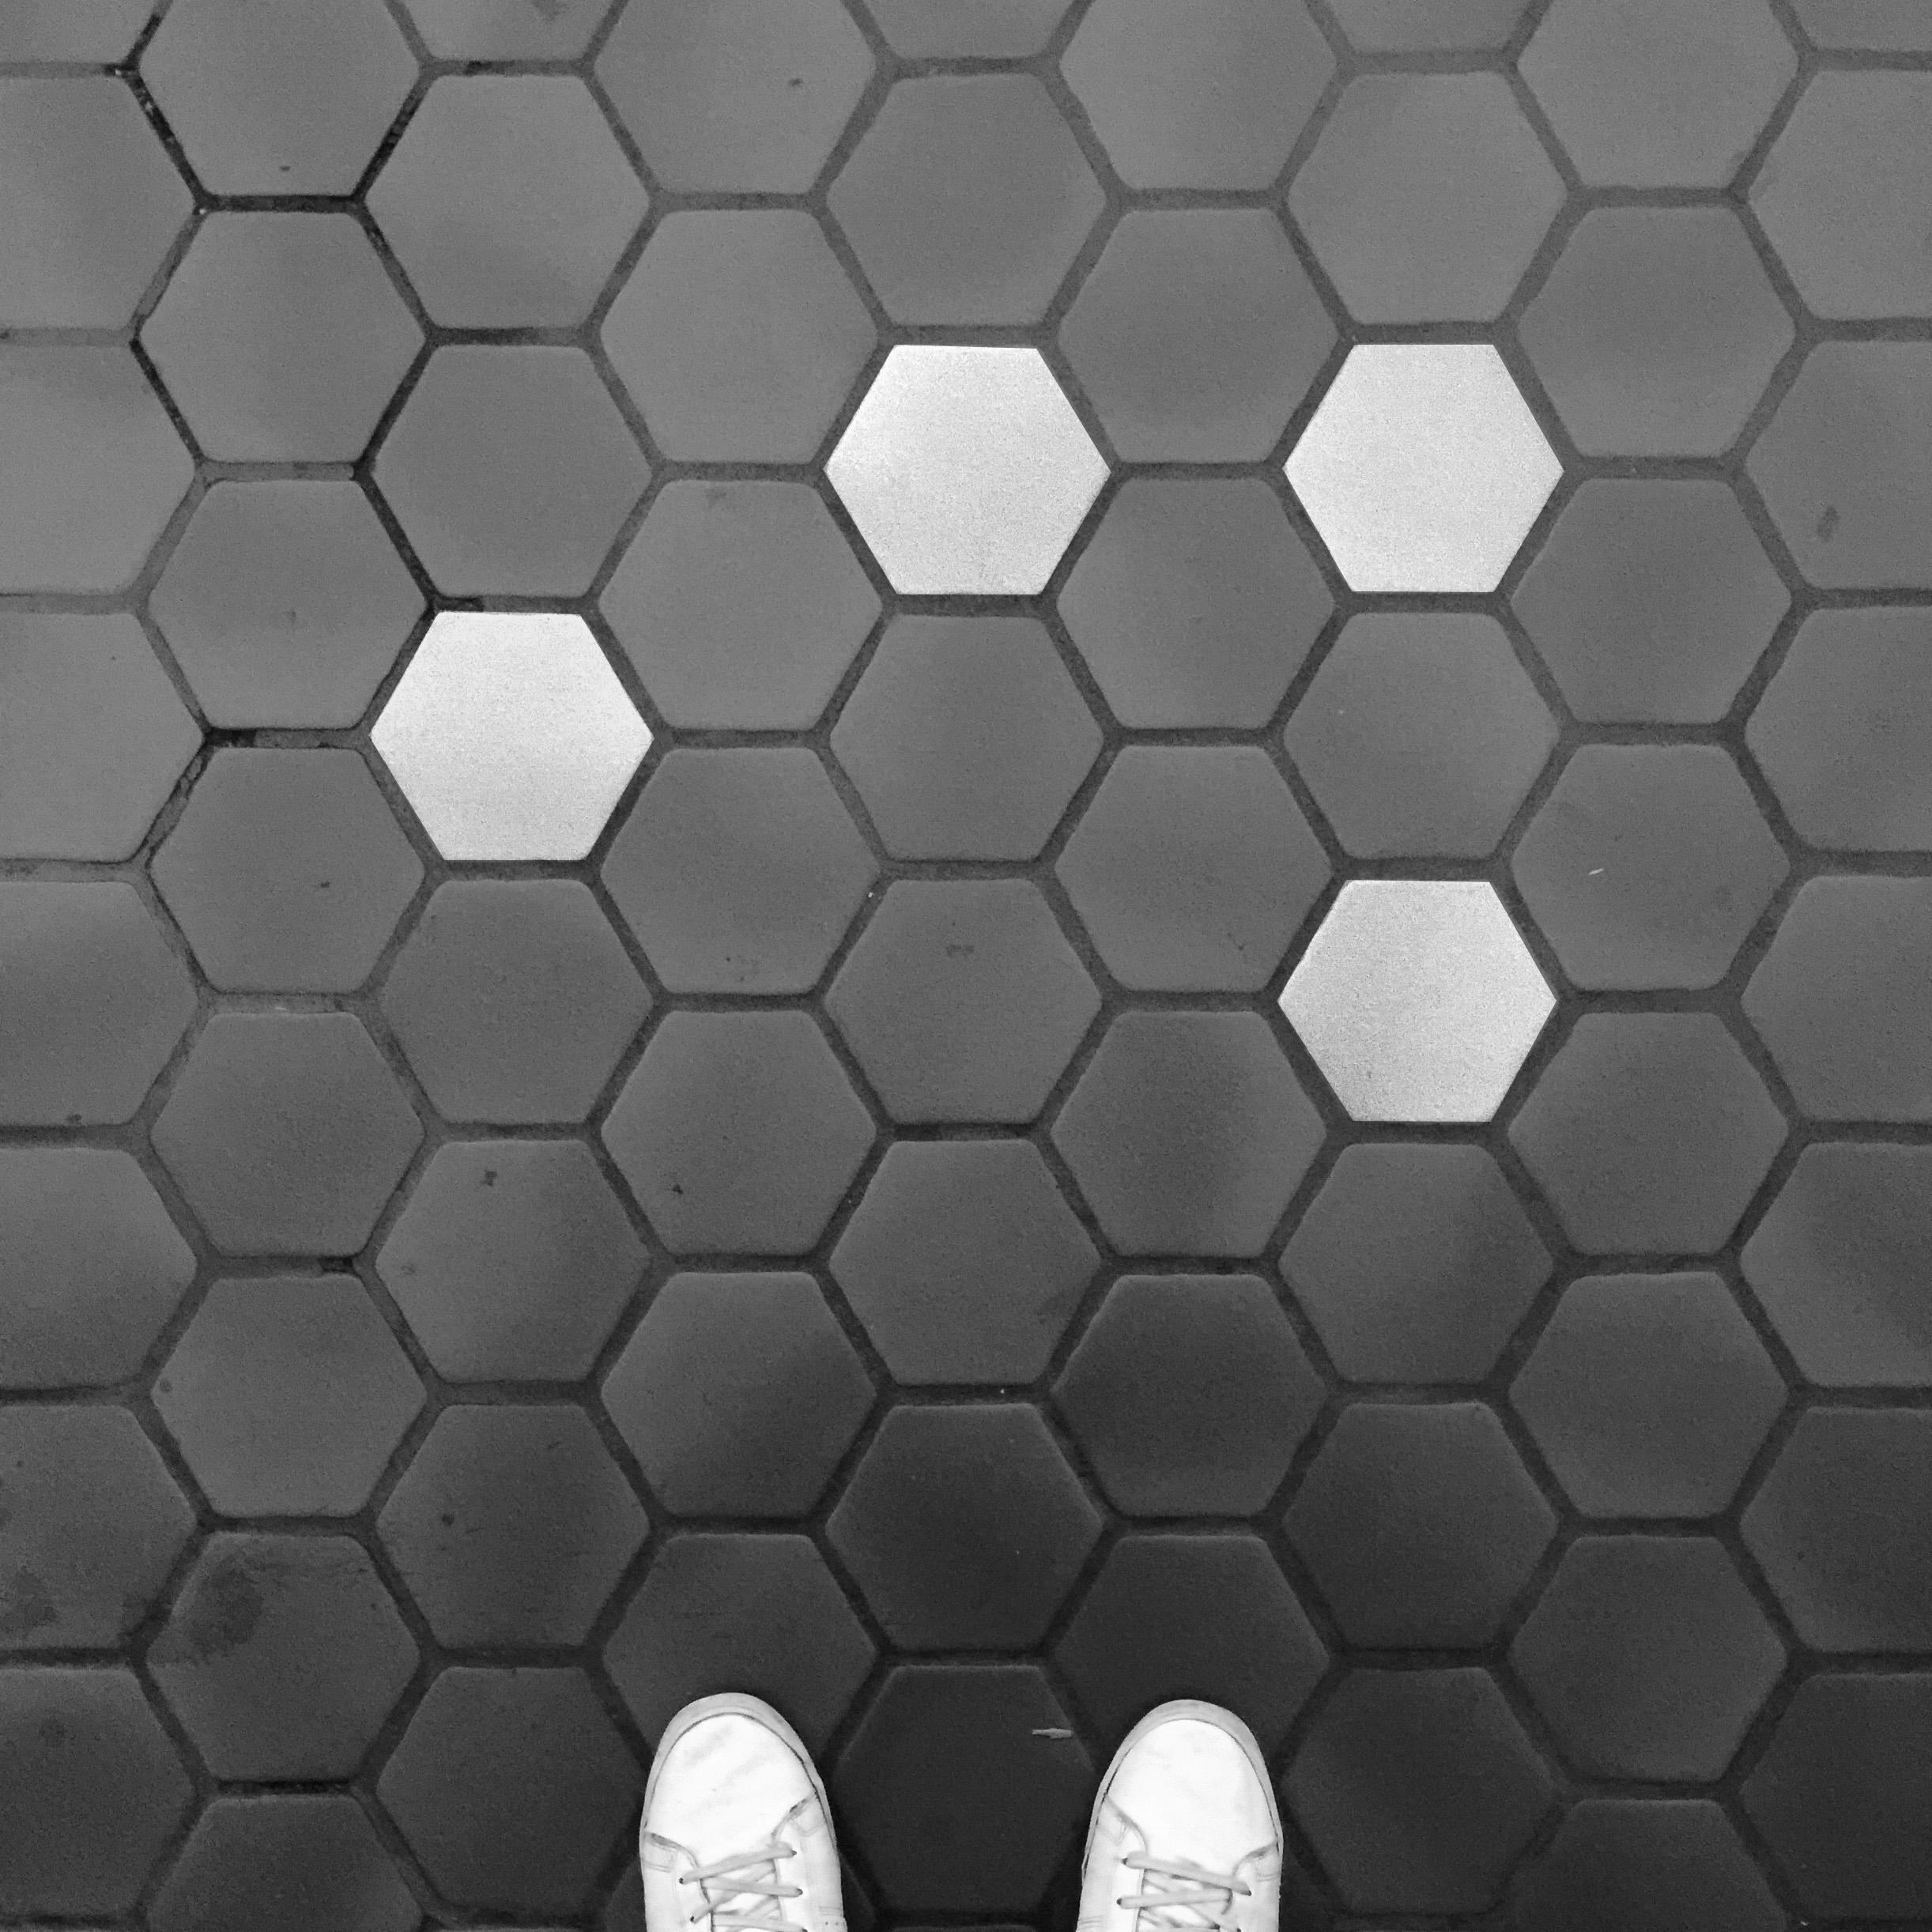 1 square Hi-Metro-Tiles-4-3-17.jpg